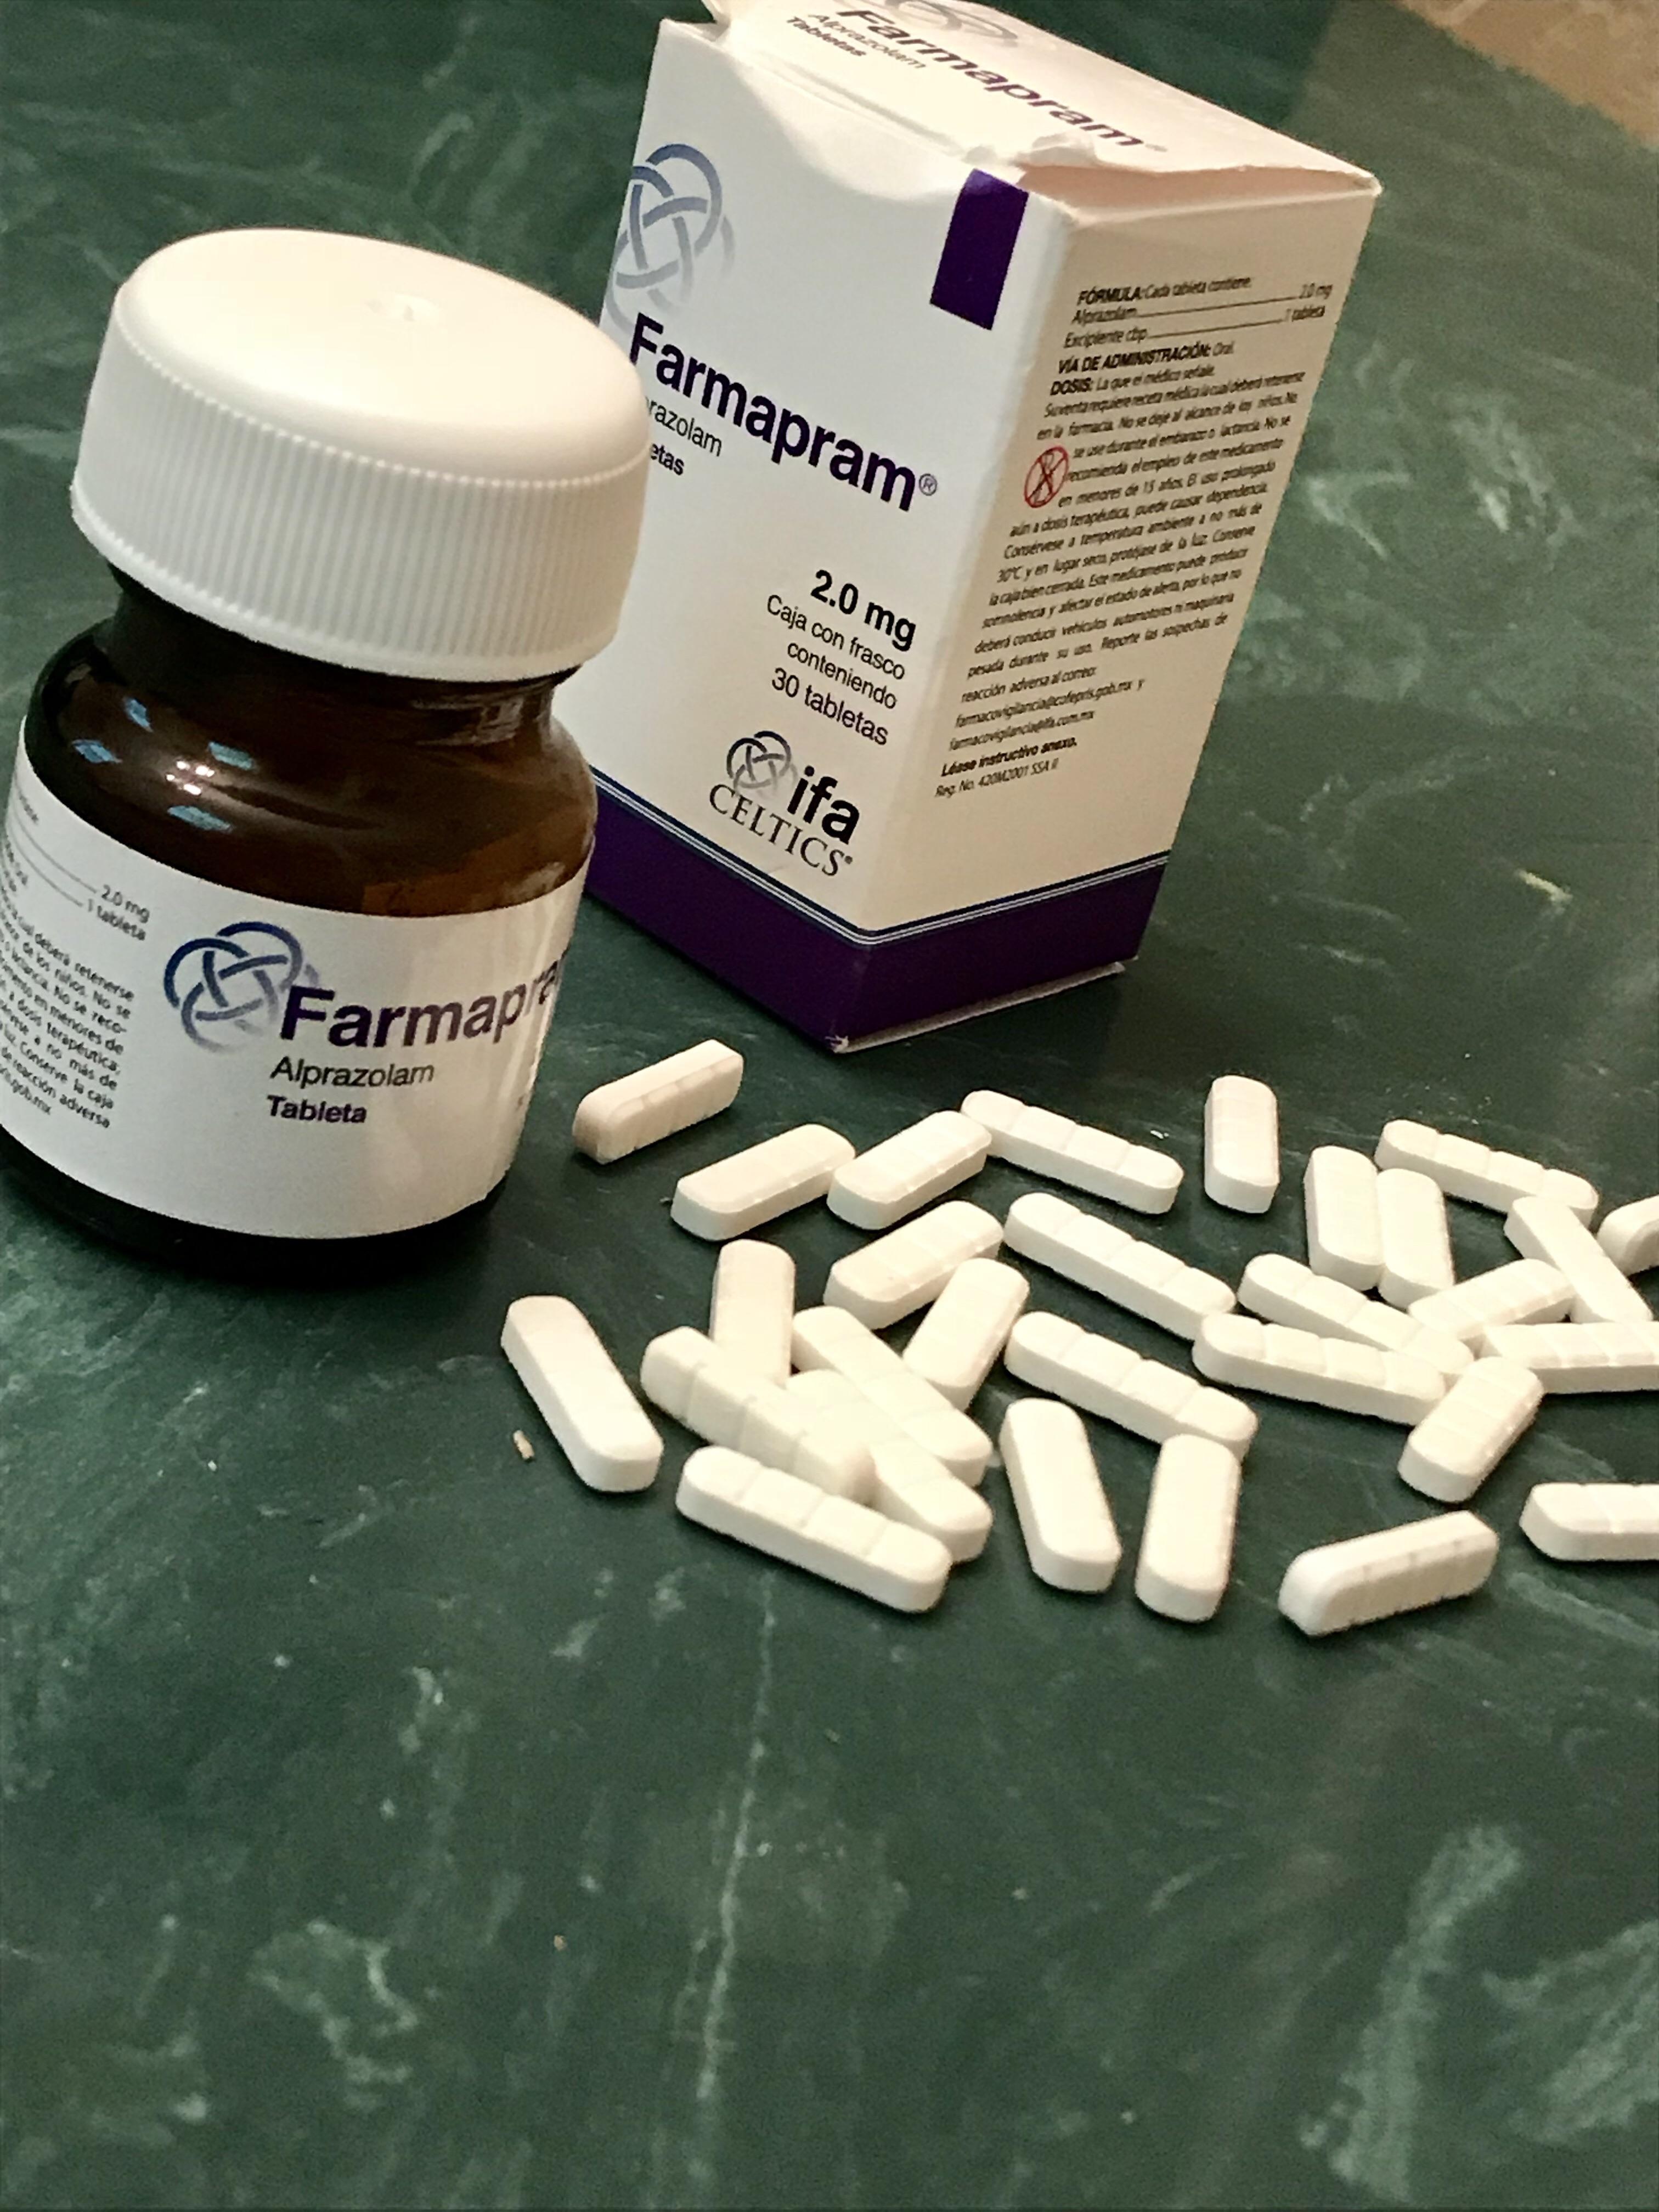 Buy Farmapram 2mg (Alprazolam) online